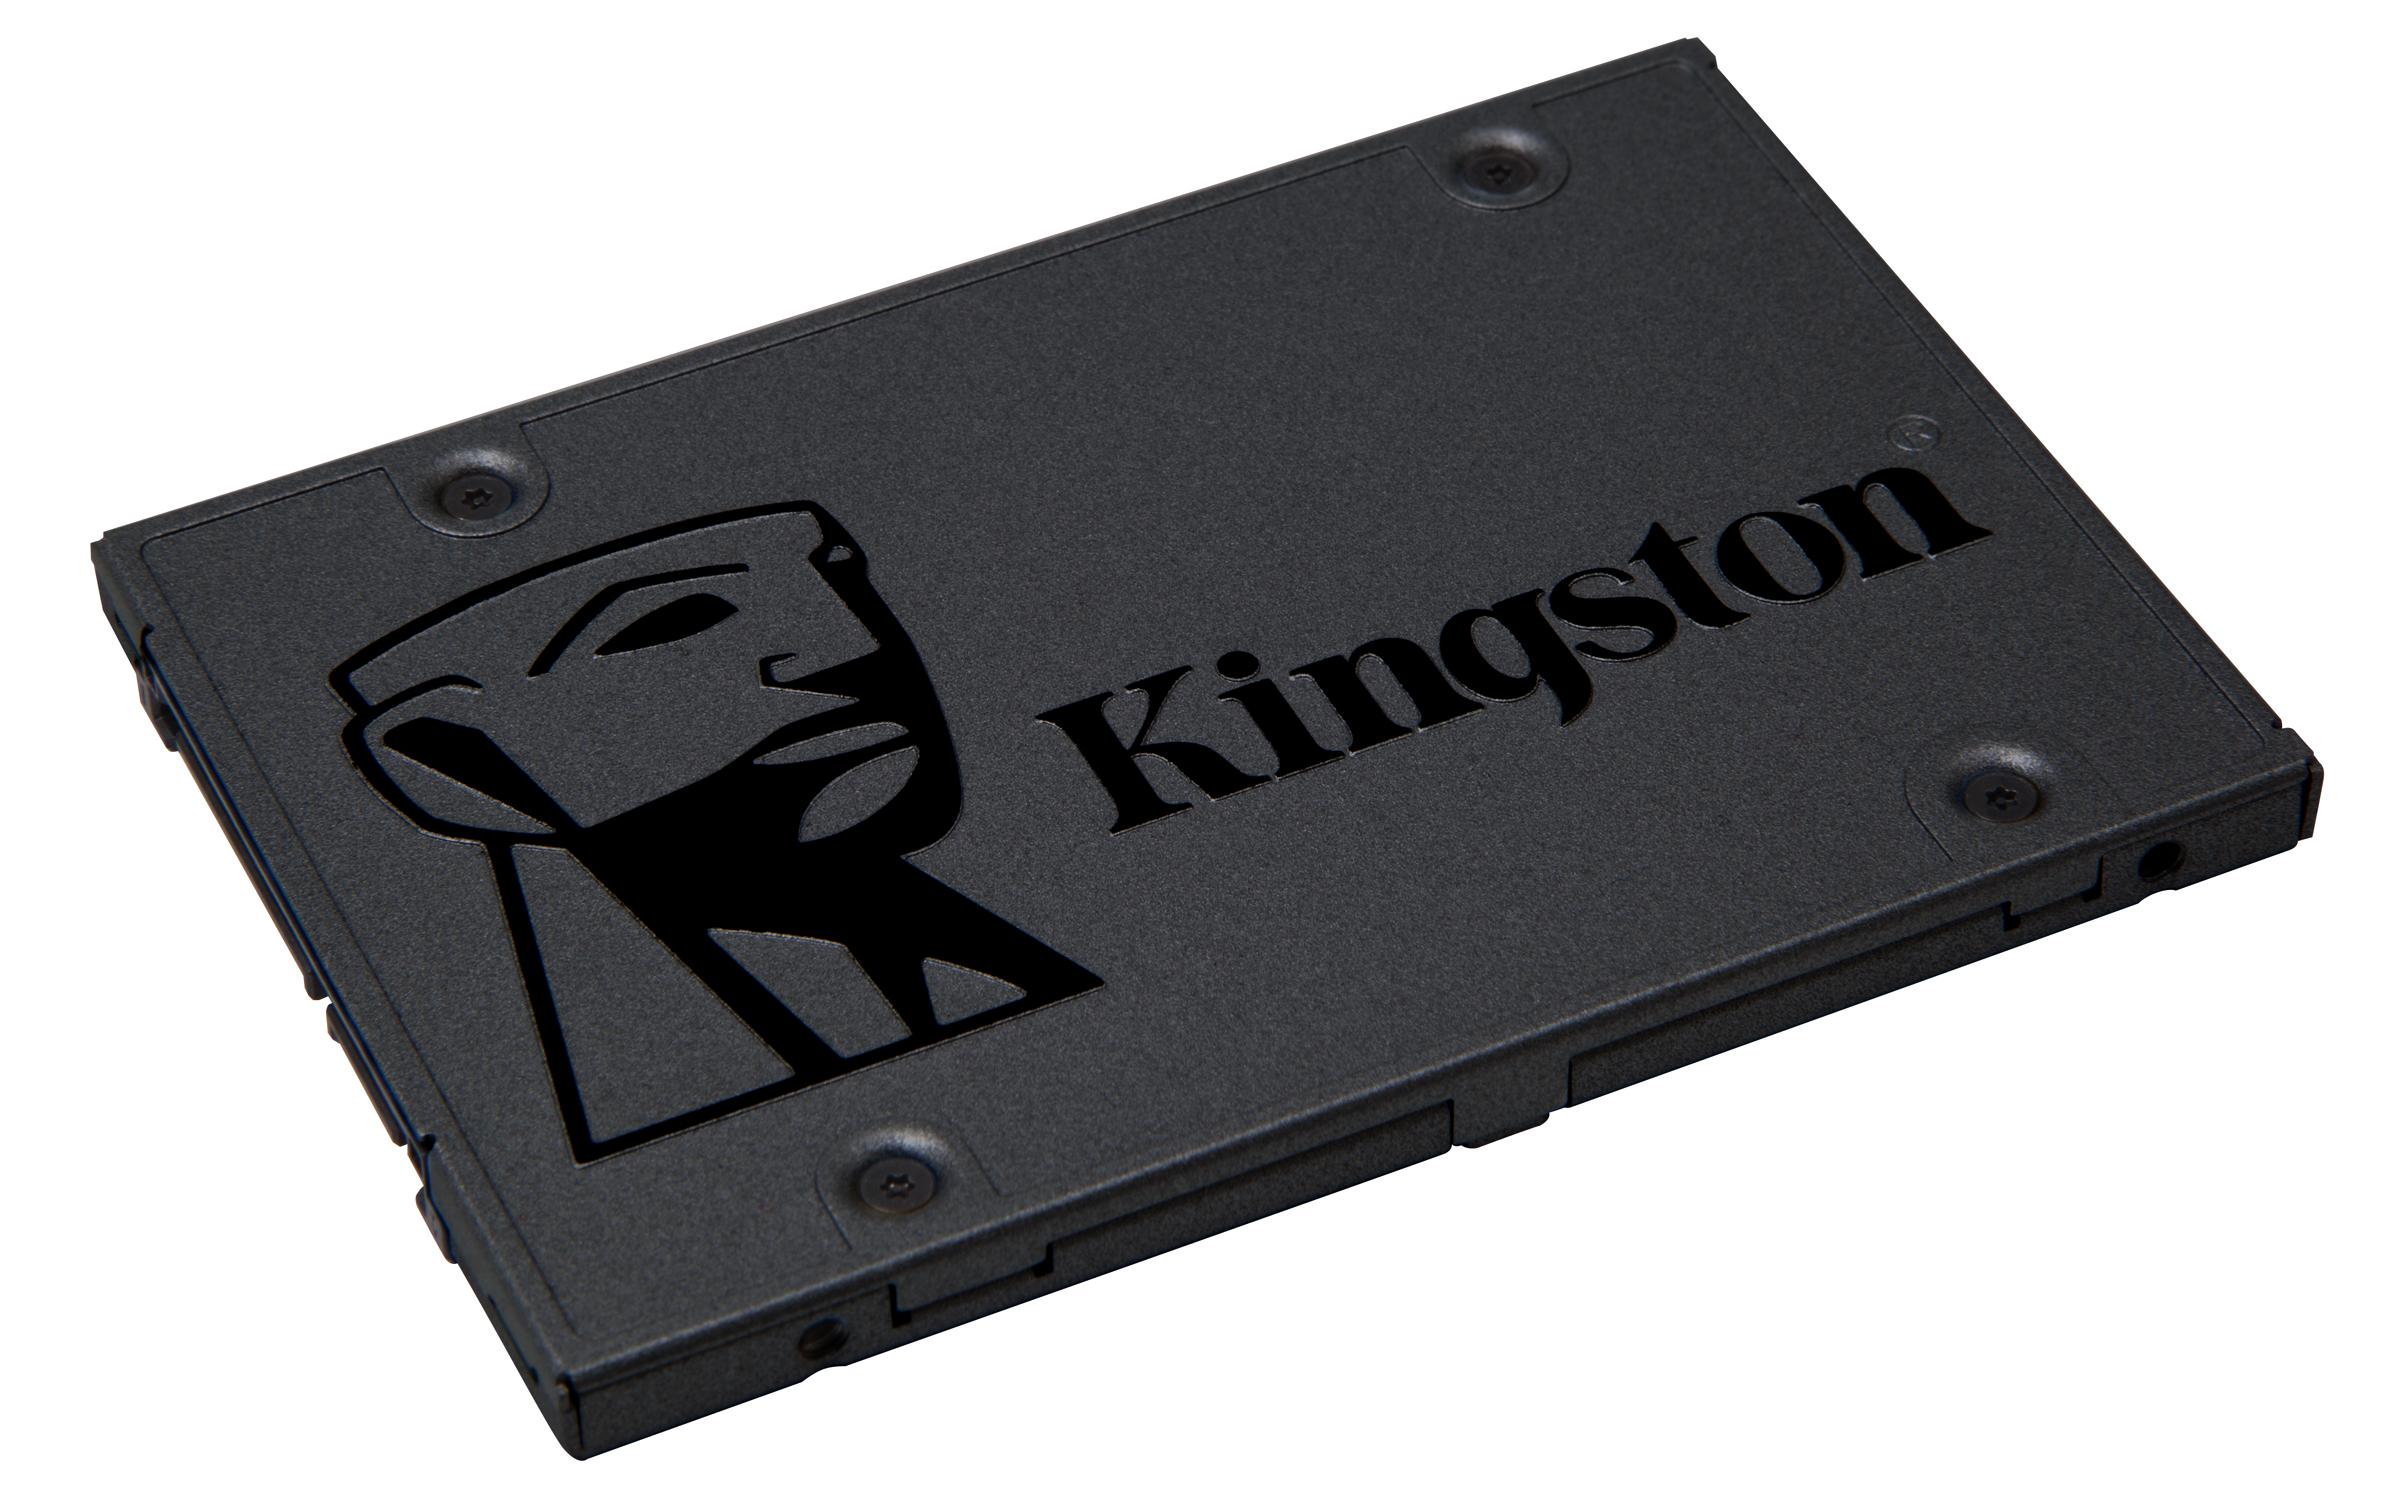 Kingston A400 SSD 480GB Serial ATA III  SA400S37/480G - eet01